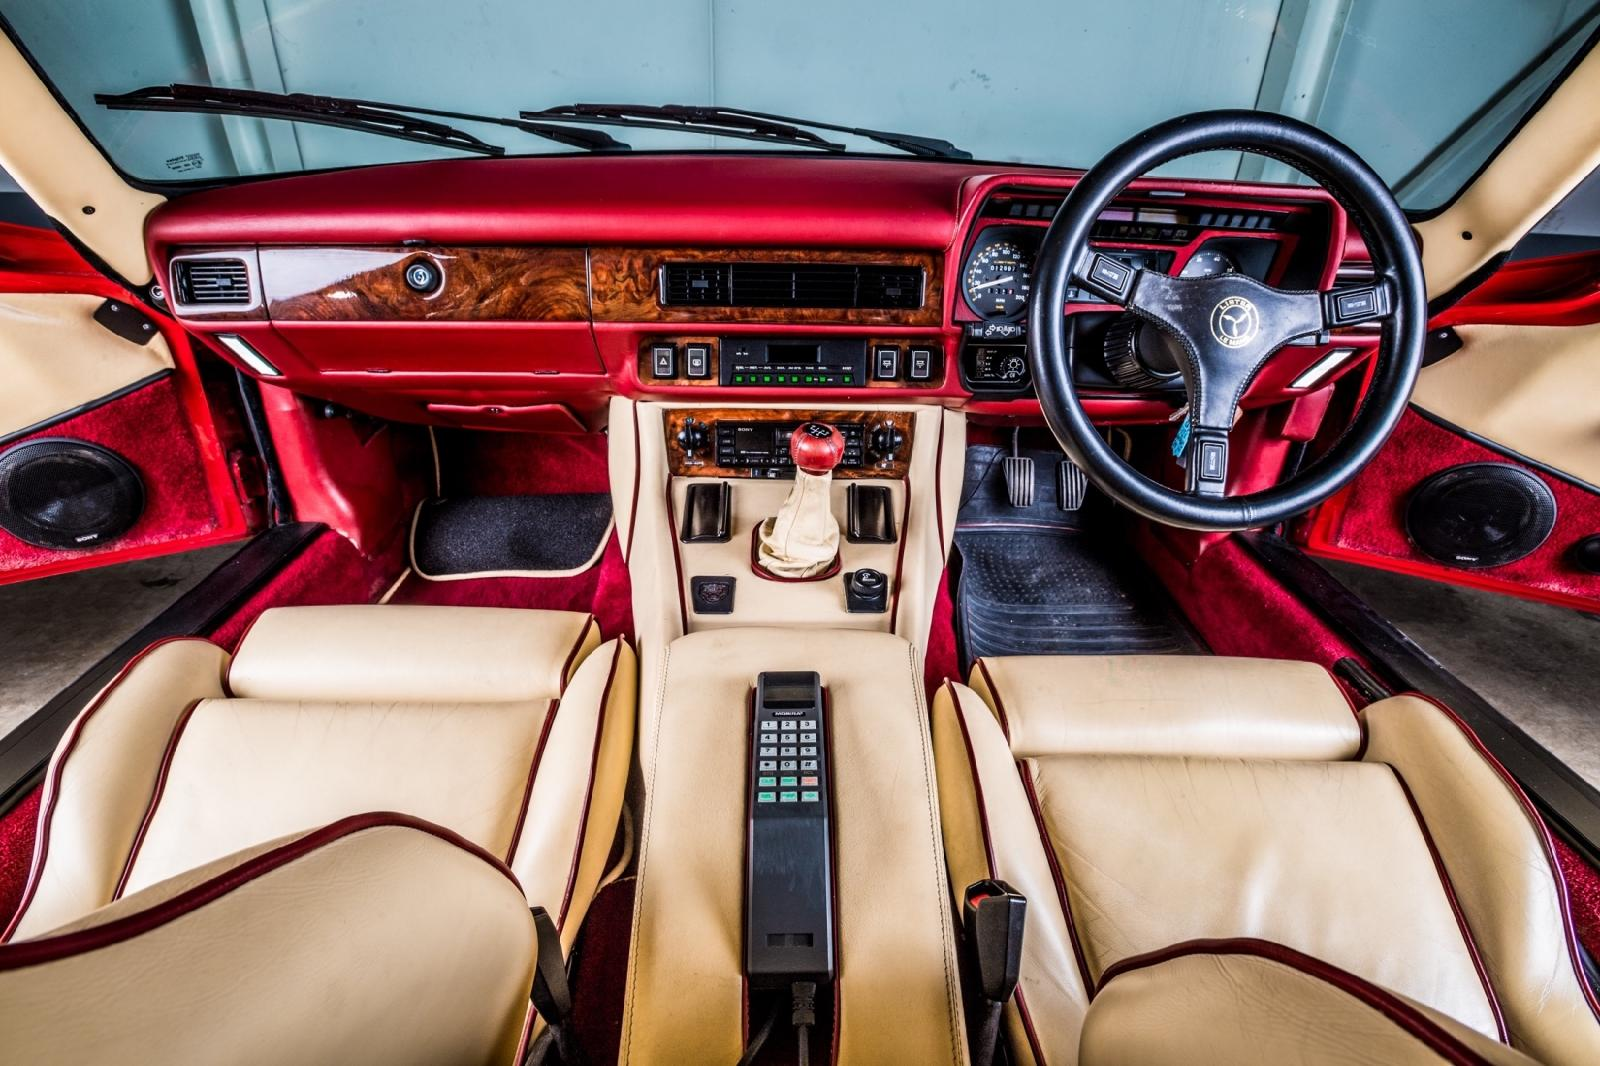 Lister Jaguar Le Mans - Lister Jaguar Le Mans